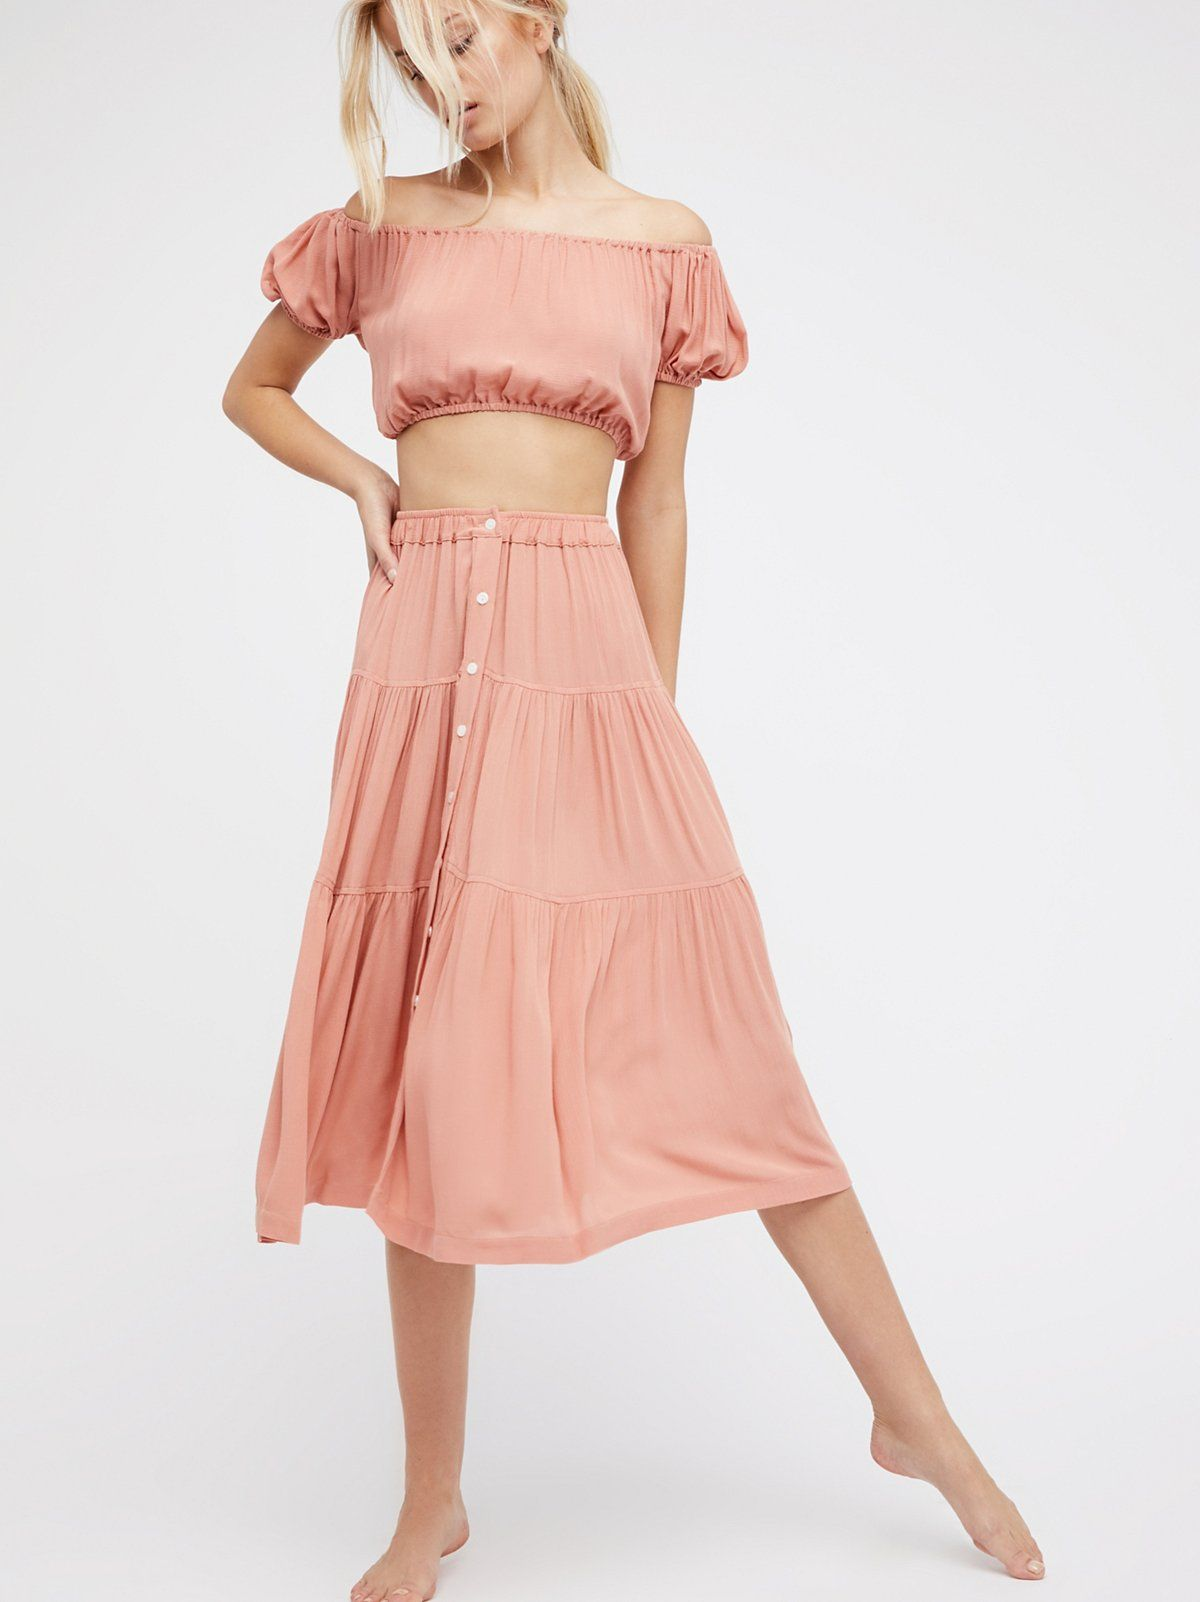 Margot Two Piece Set Fashion Crop Dress Two Piece Dress